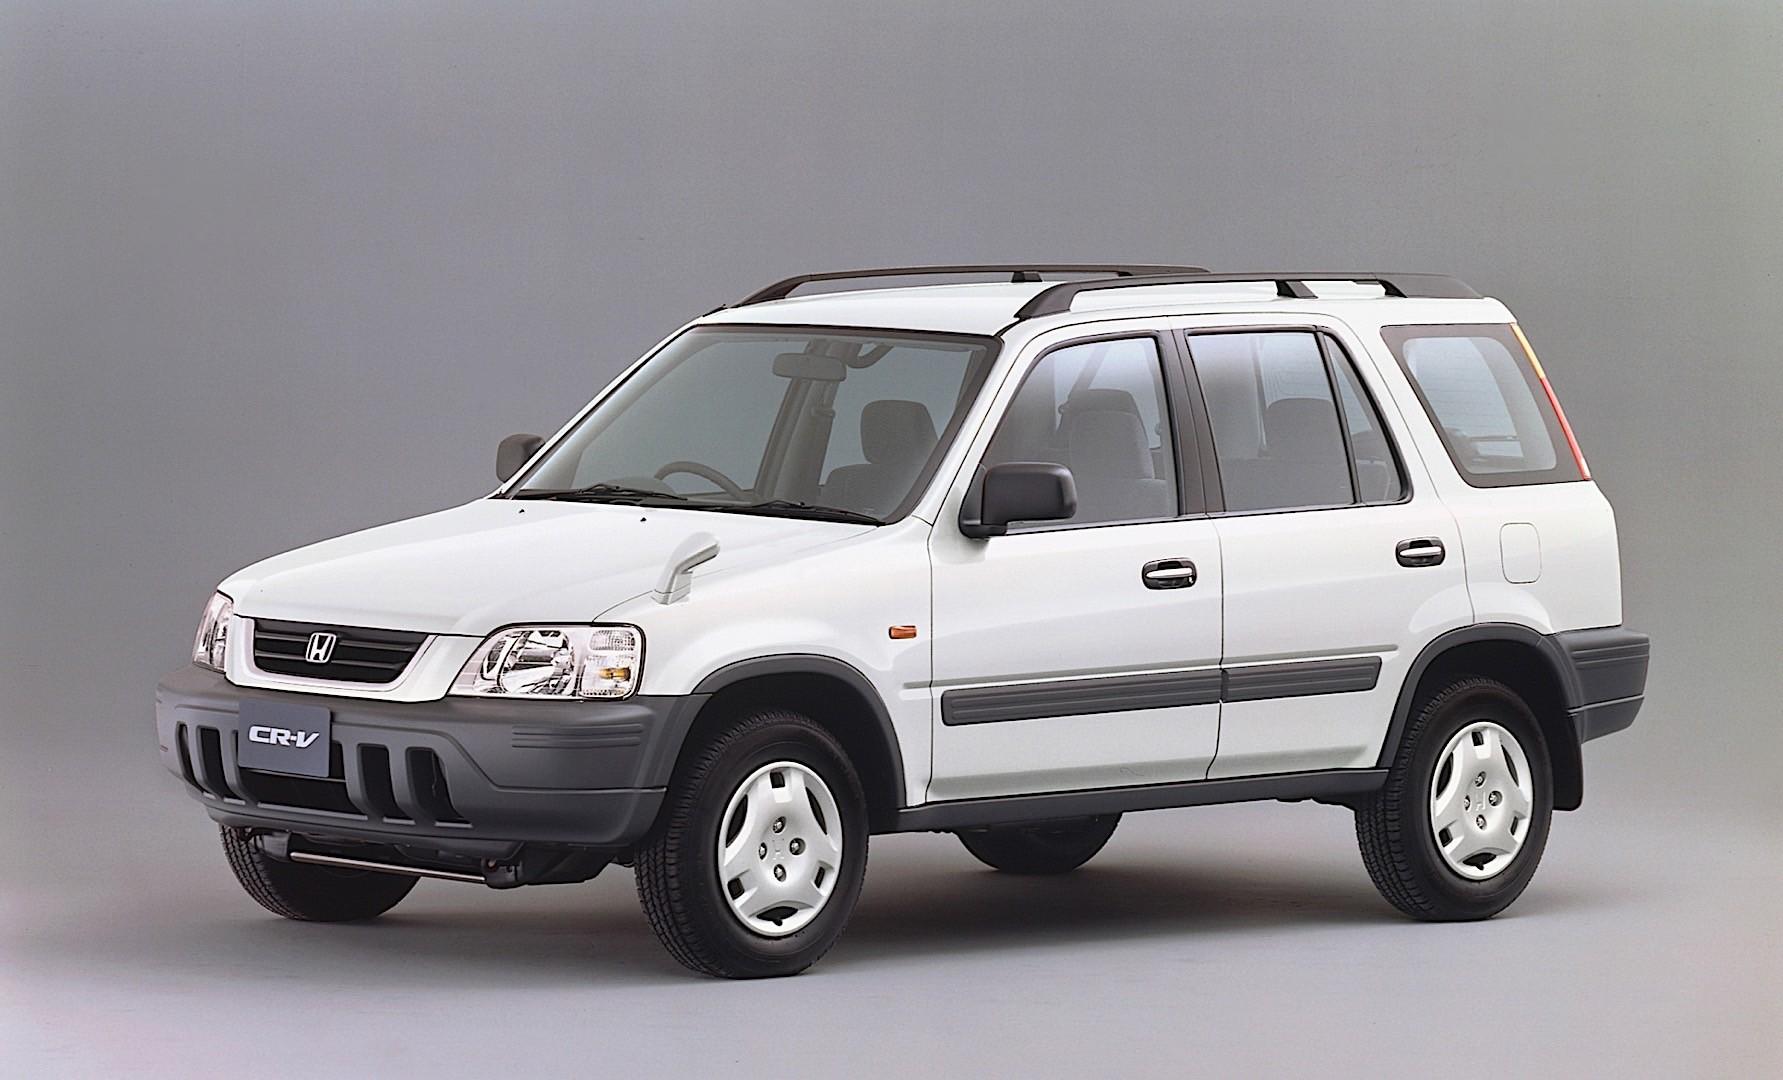 Honda S2000 Specs >> HONDA CR-V specs & photos - 1996, 1997, 1998, 1999, 2000, 2001 - autoevolution